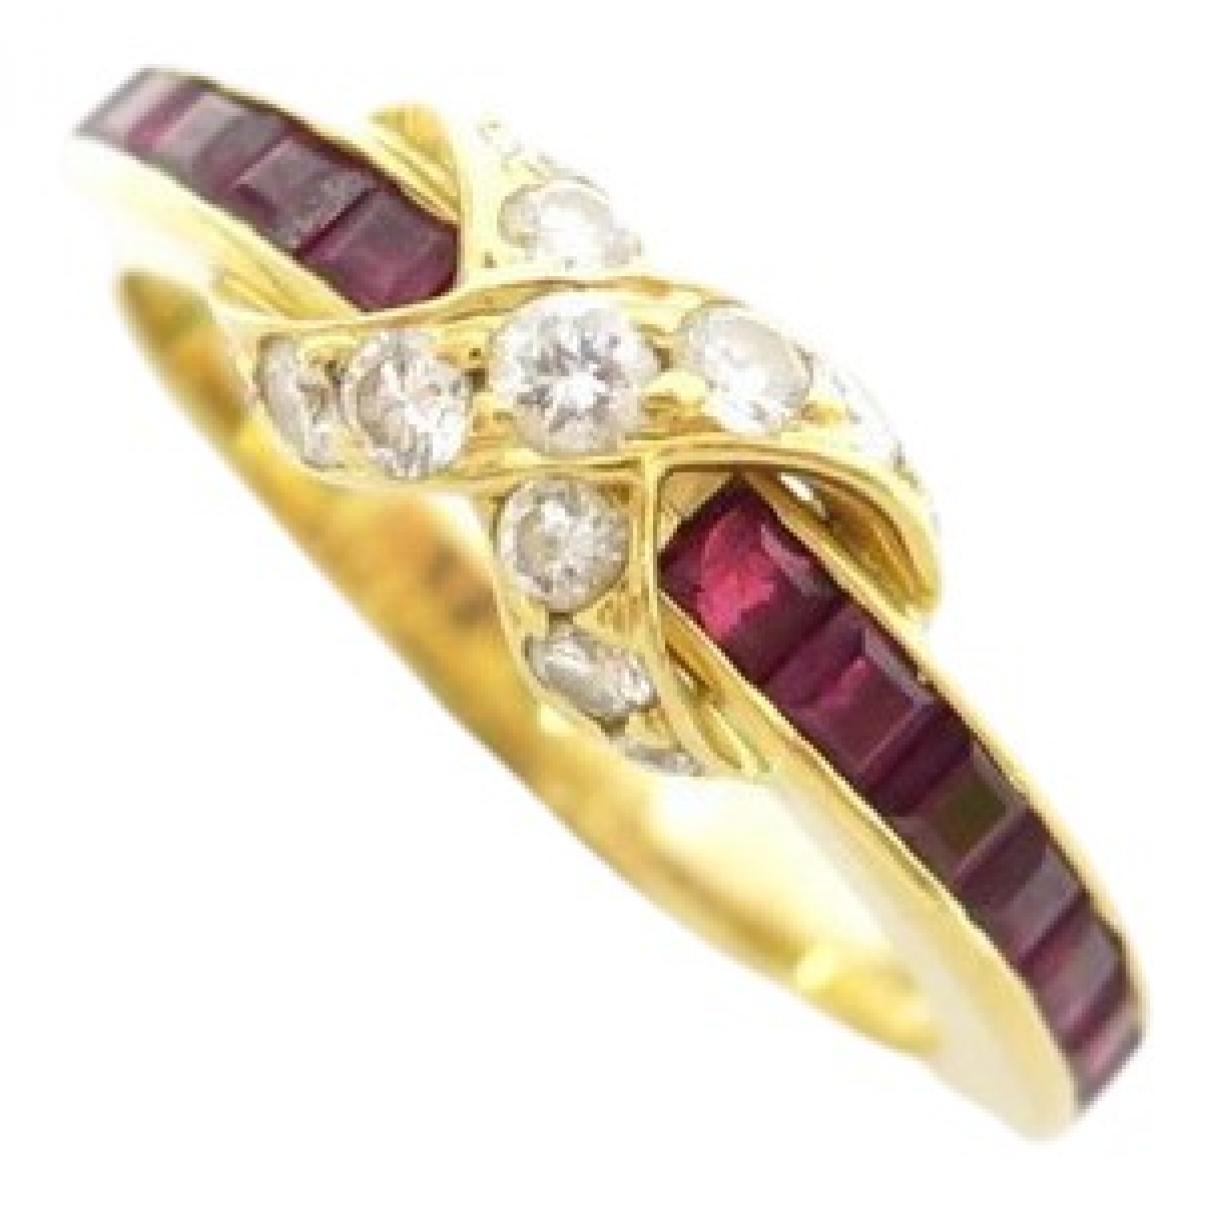 Tiffany & Co - Bague Tiffany Infinity pour femme en or jaune - dore